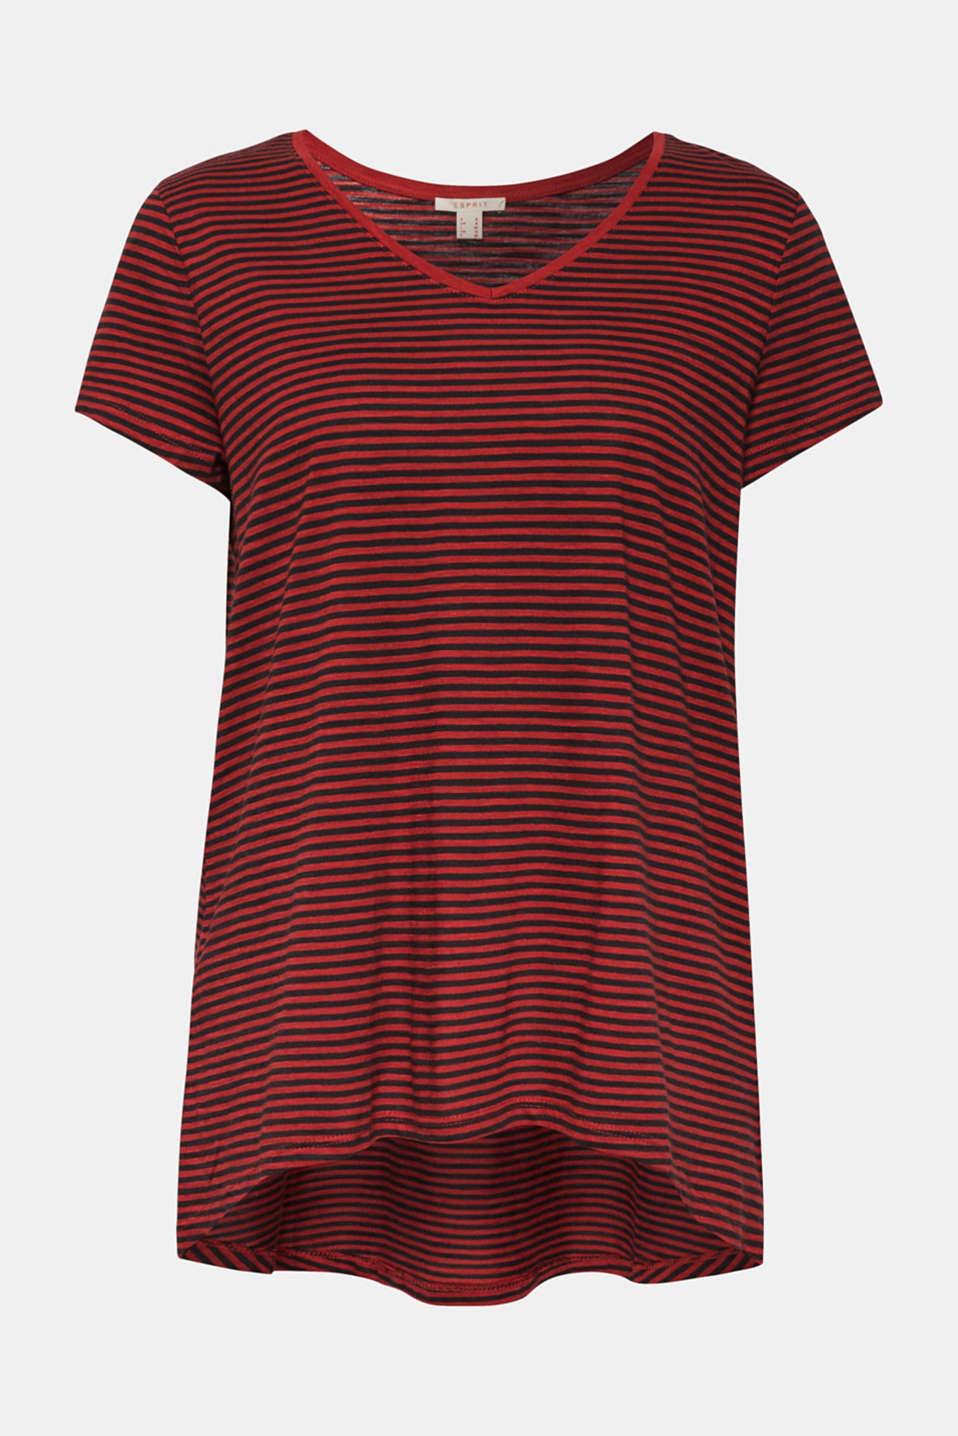 T-Shirts, DARK RED, detail image number 7